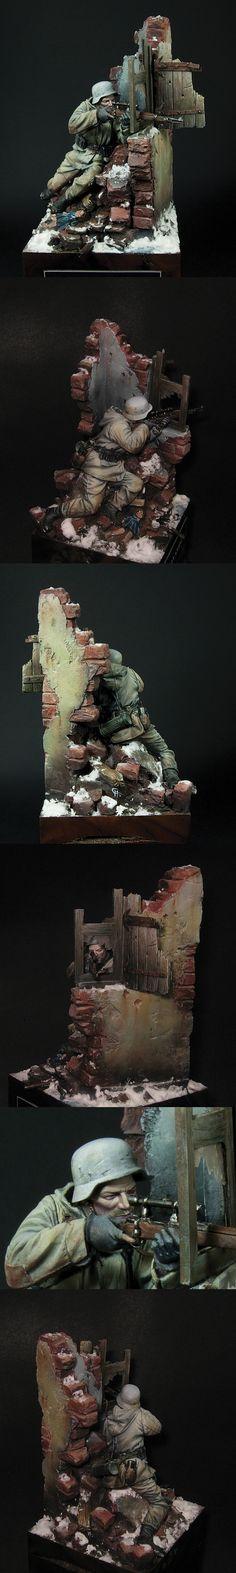 CoolMiniOrNot - German Sniper- Stalingrad 1943 by Mauganra